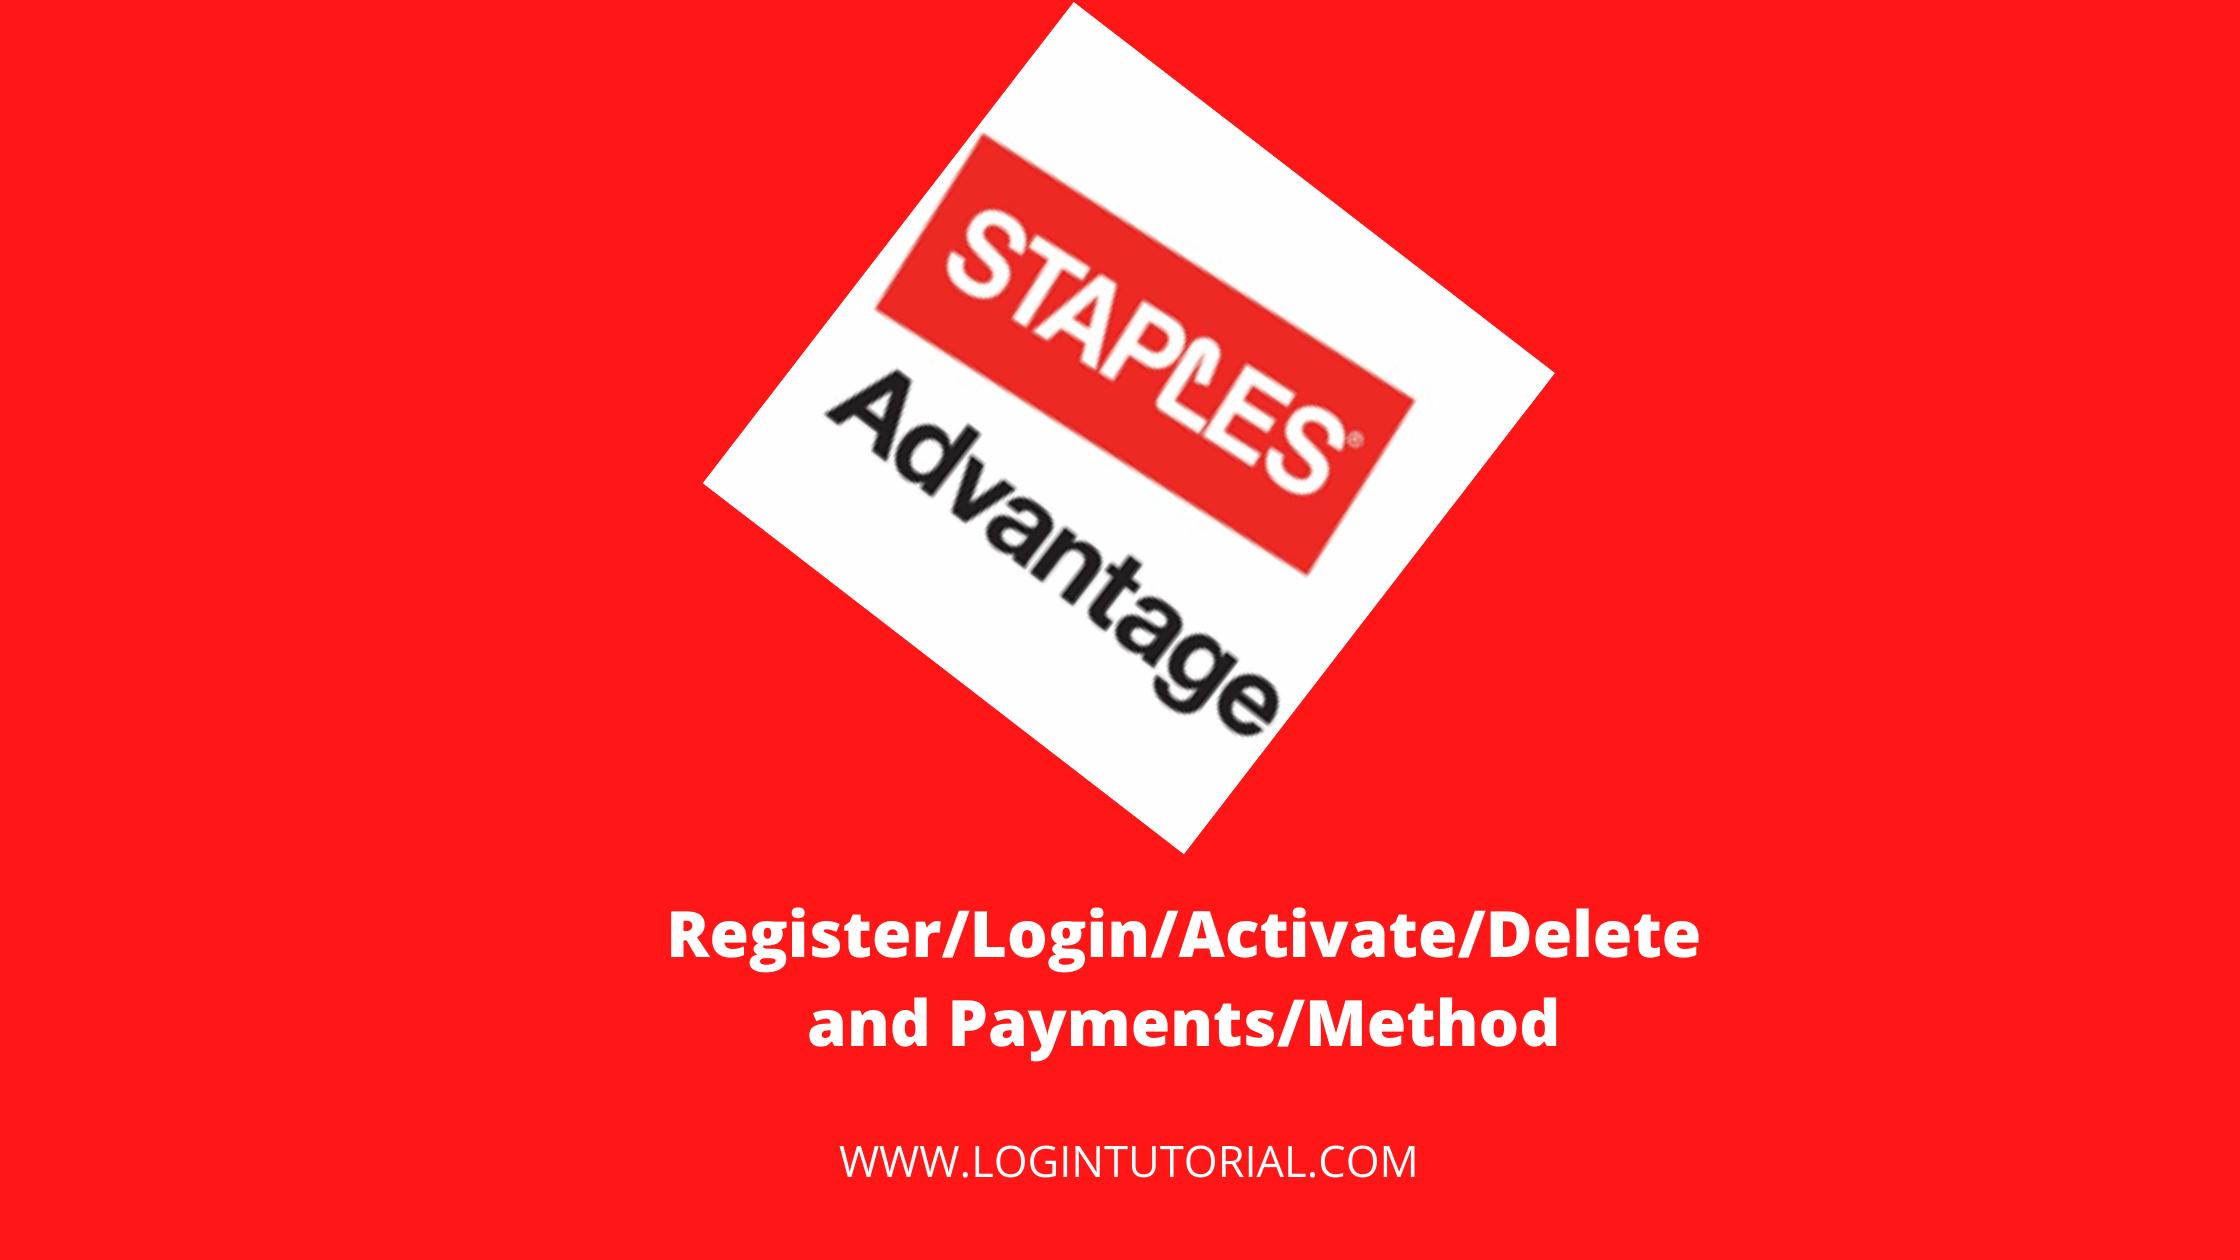 staples advantage login guide